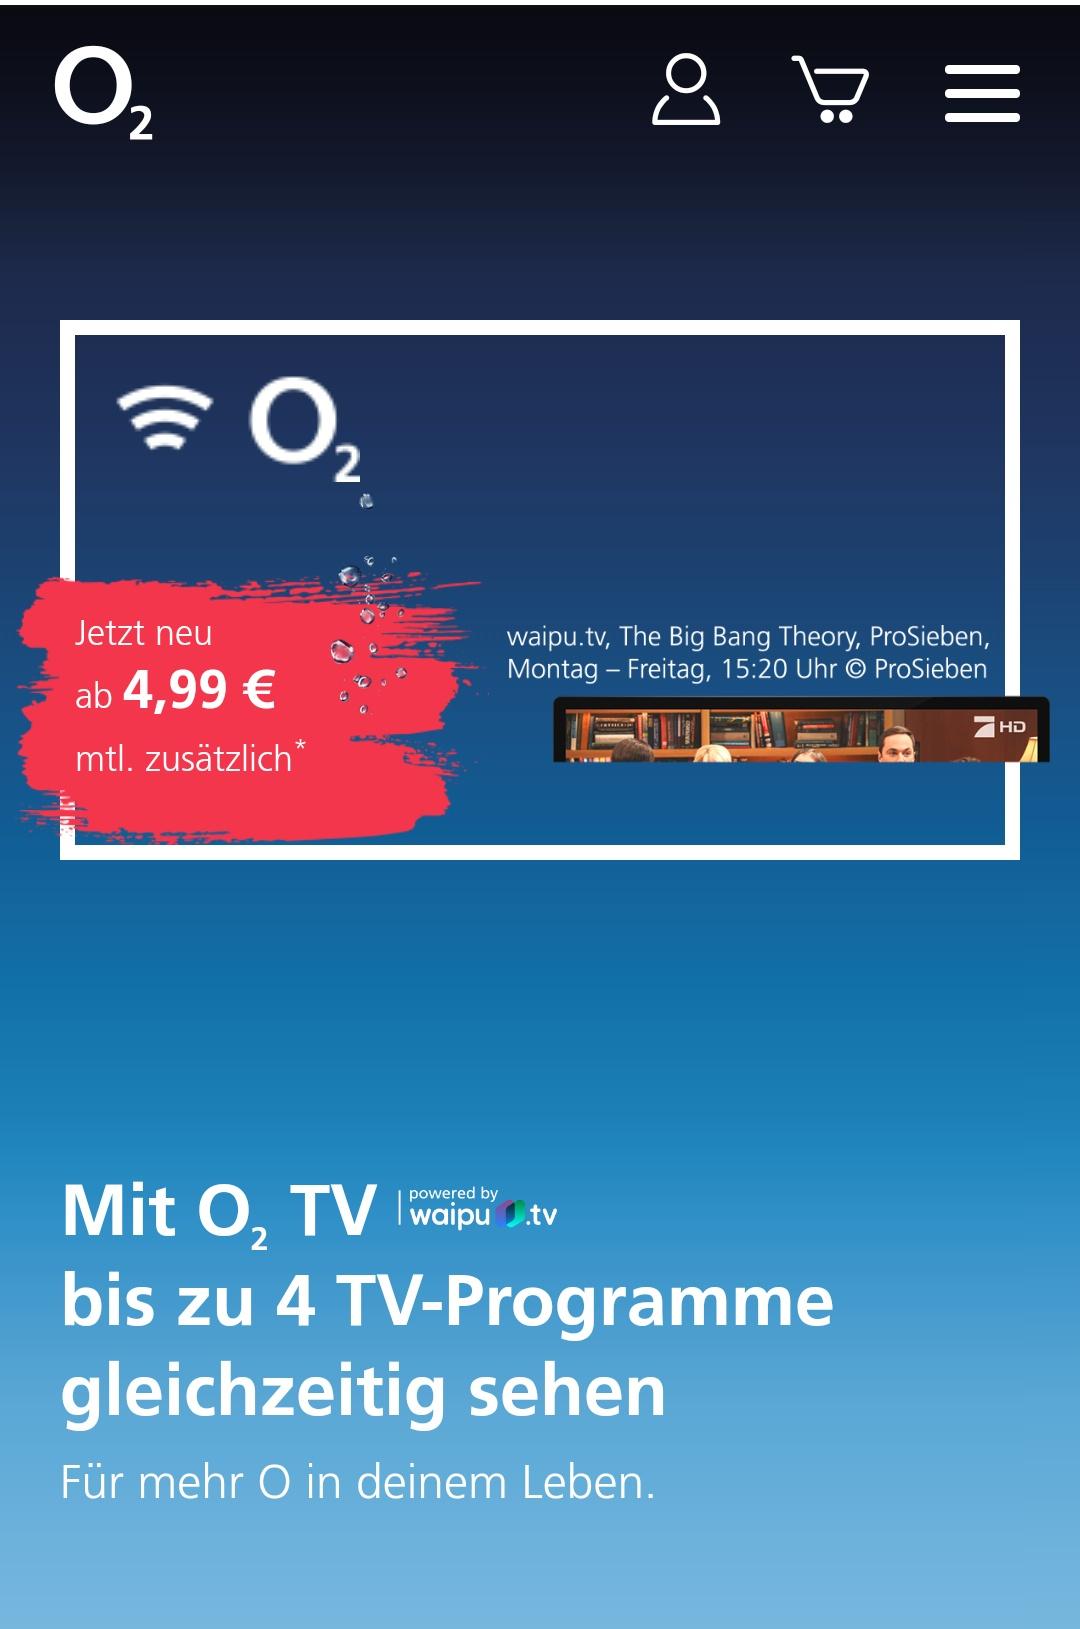 O2 TV - online TV mit Waipu TV